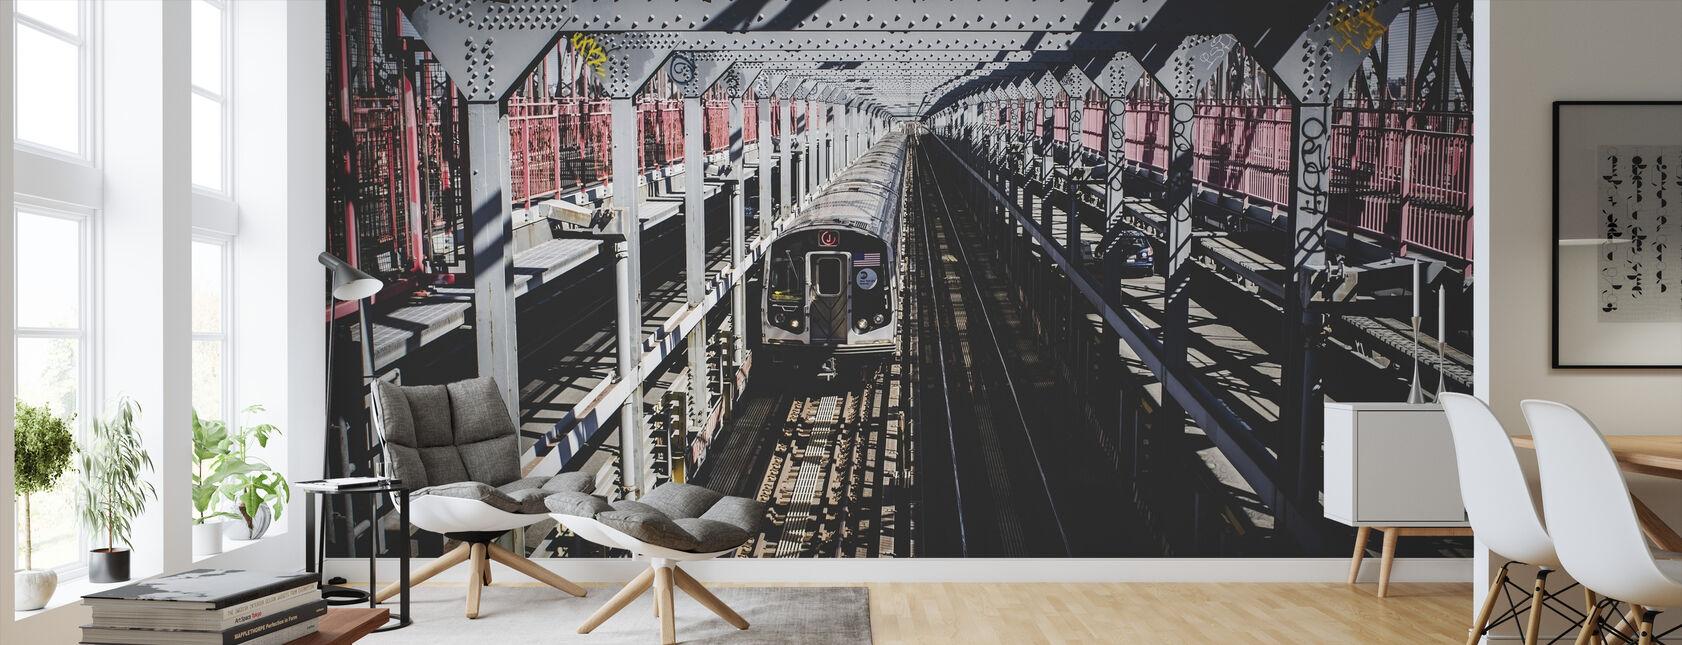 Junan kuljetus - Tapetti - Olohuone